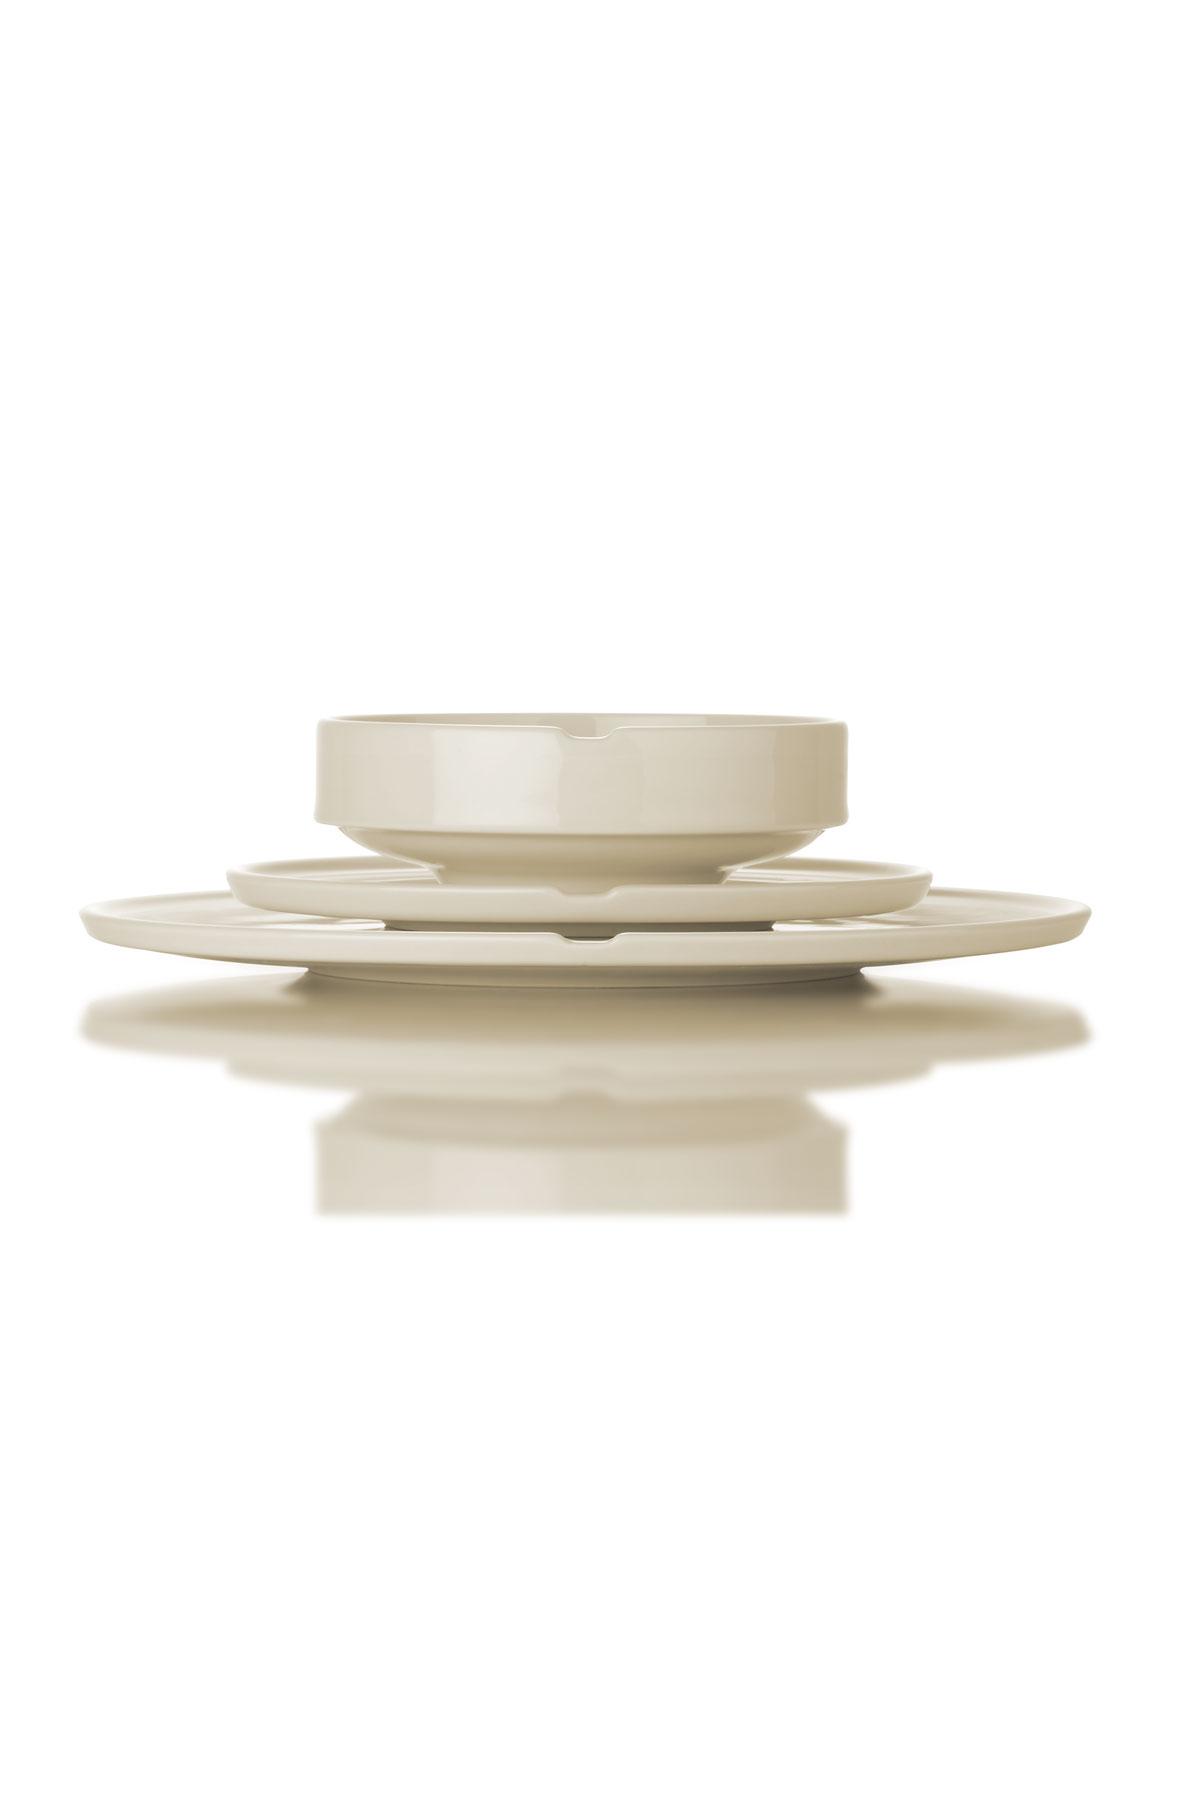 Kütahya Porselen Chef Taste Of 08 cm Joker Kase Krem